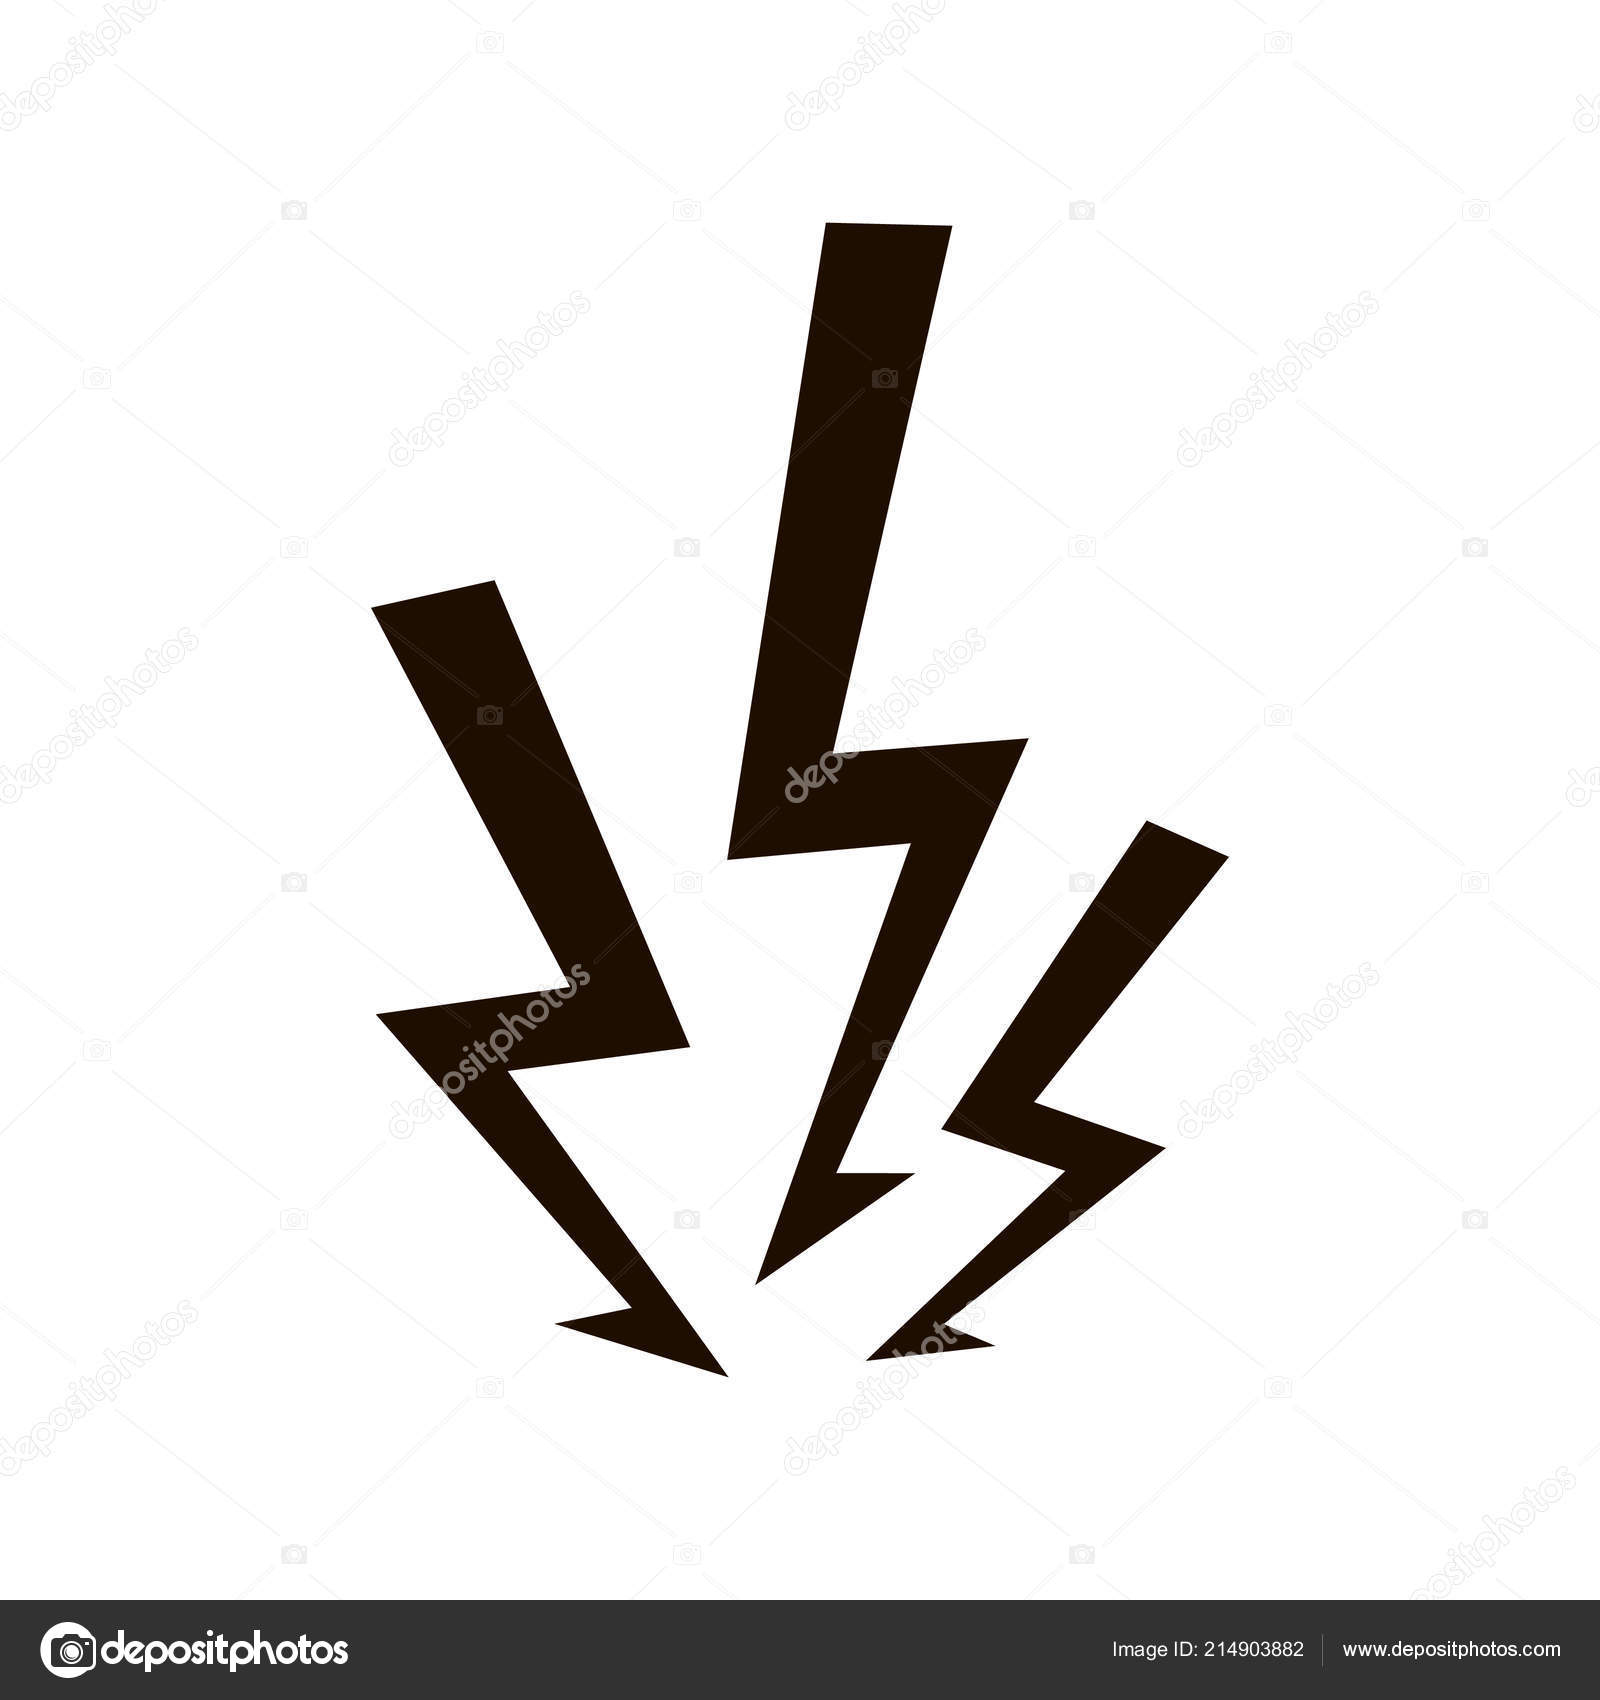 lightning vector icon set thunder charging power electricity energy batteries stock vector c irysha279 gmail com 214903882 https depositphotos com 214903882 stock illustration lightning vector icon set thunder html